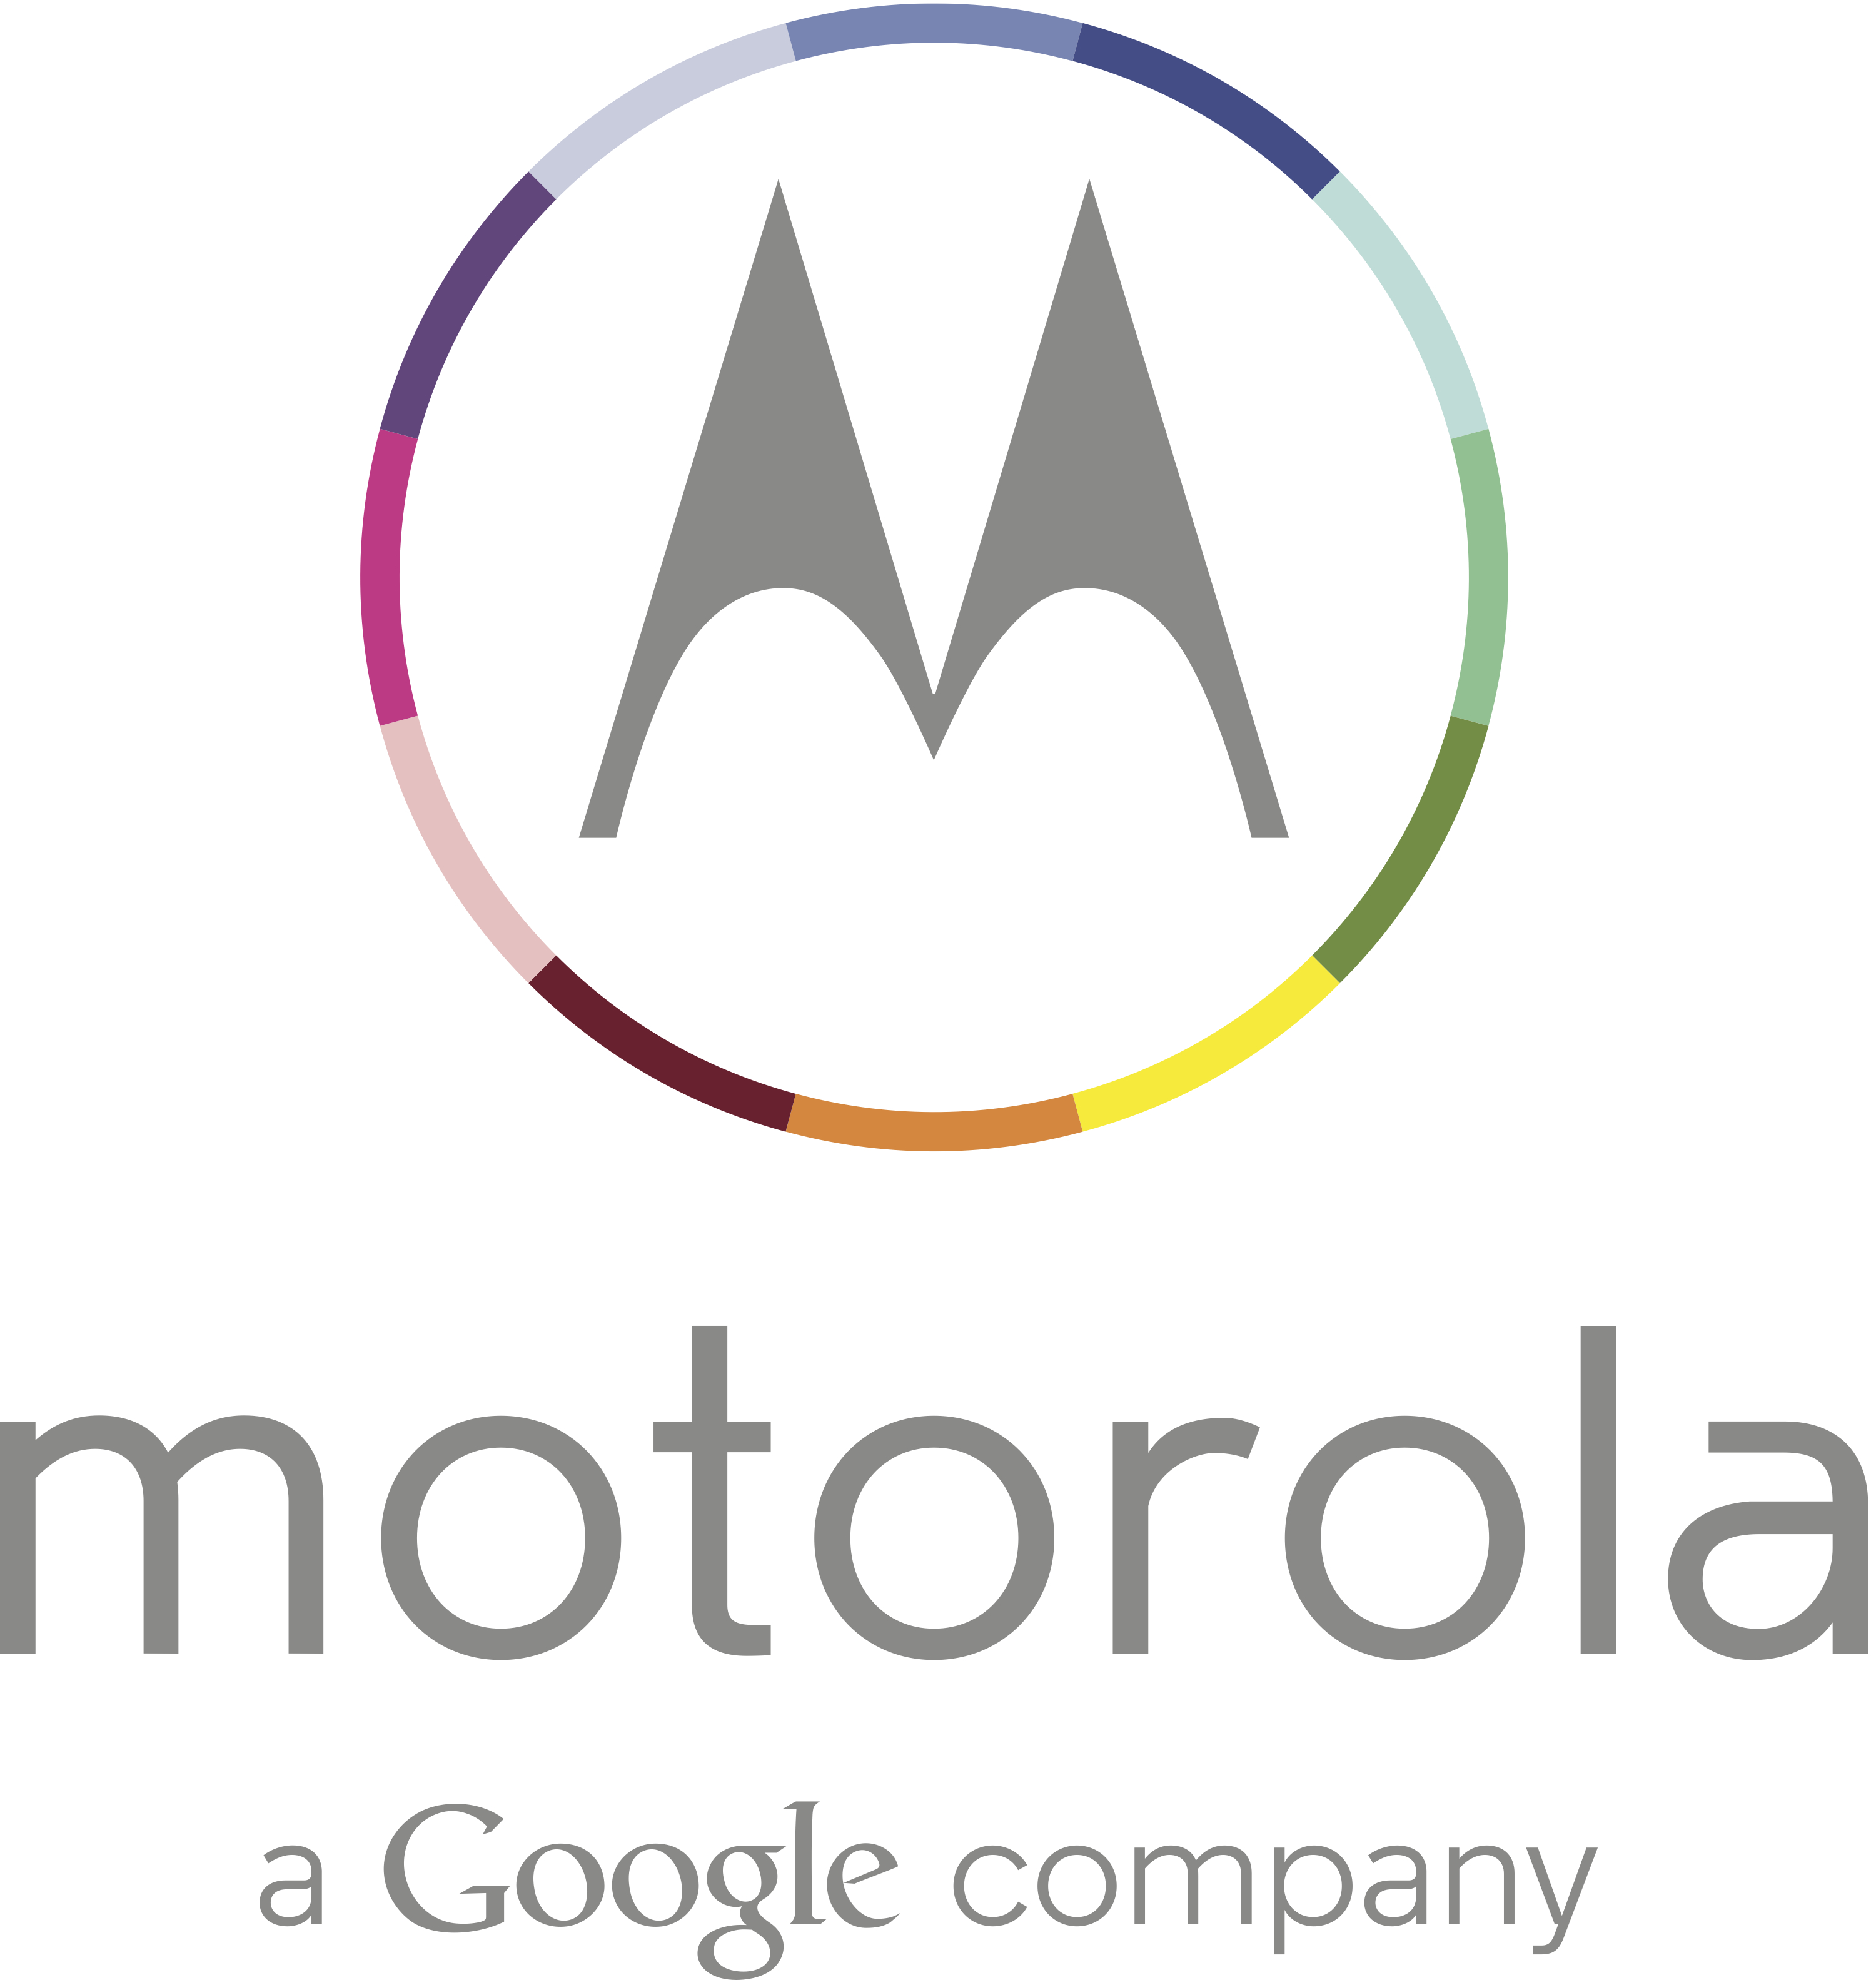 Motorola-logo-full-size